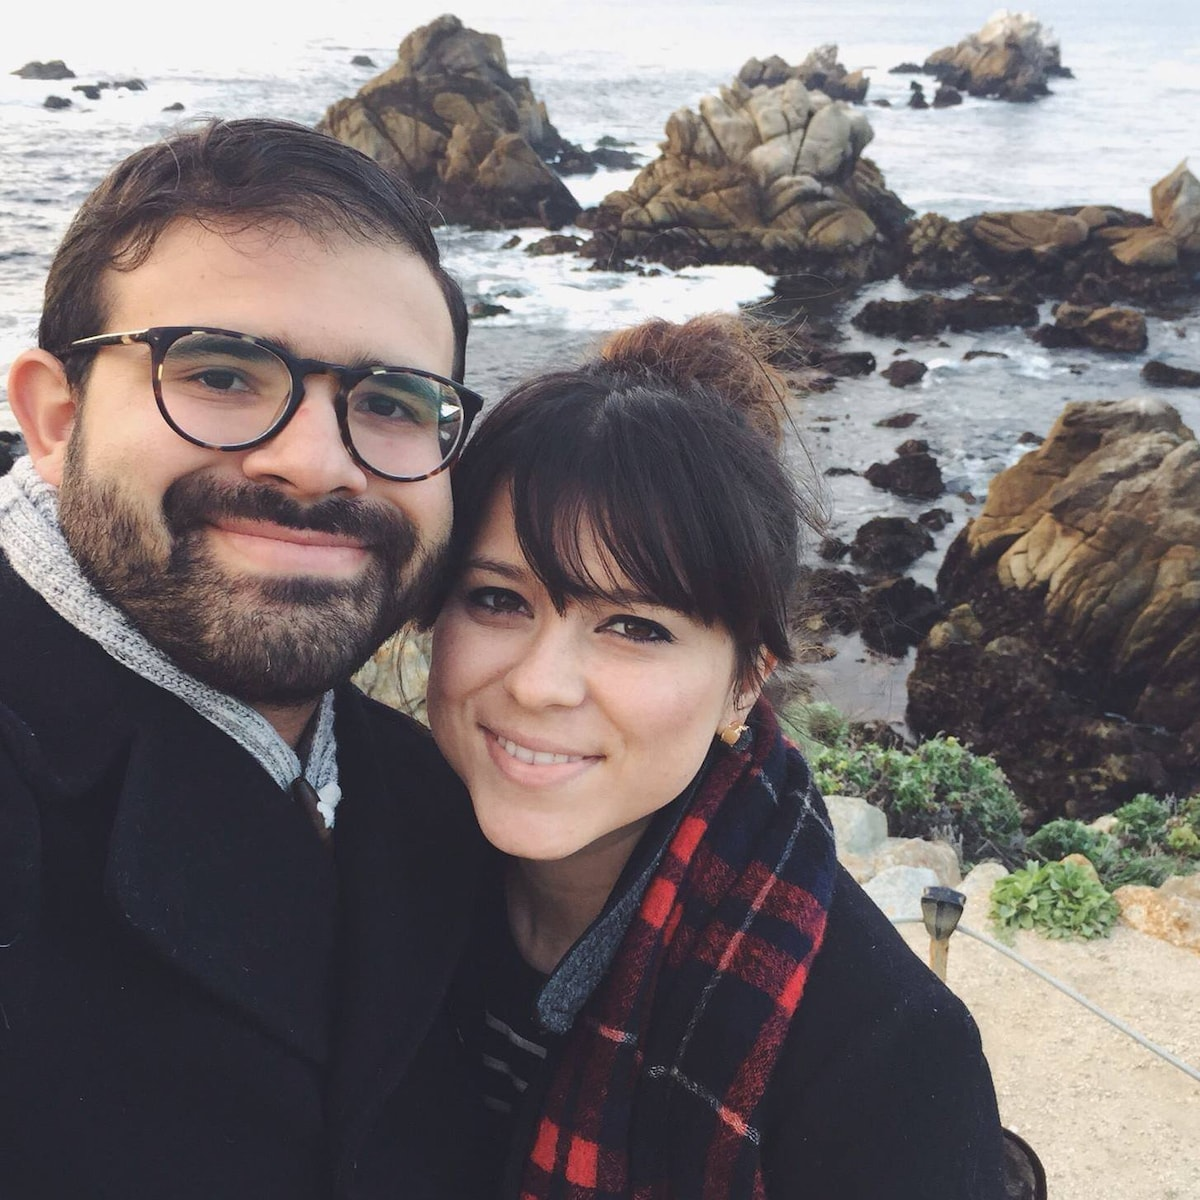 Joshua & Brooke from Pasadena